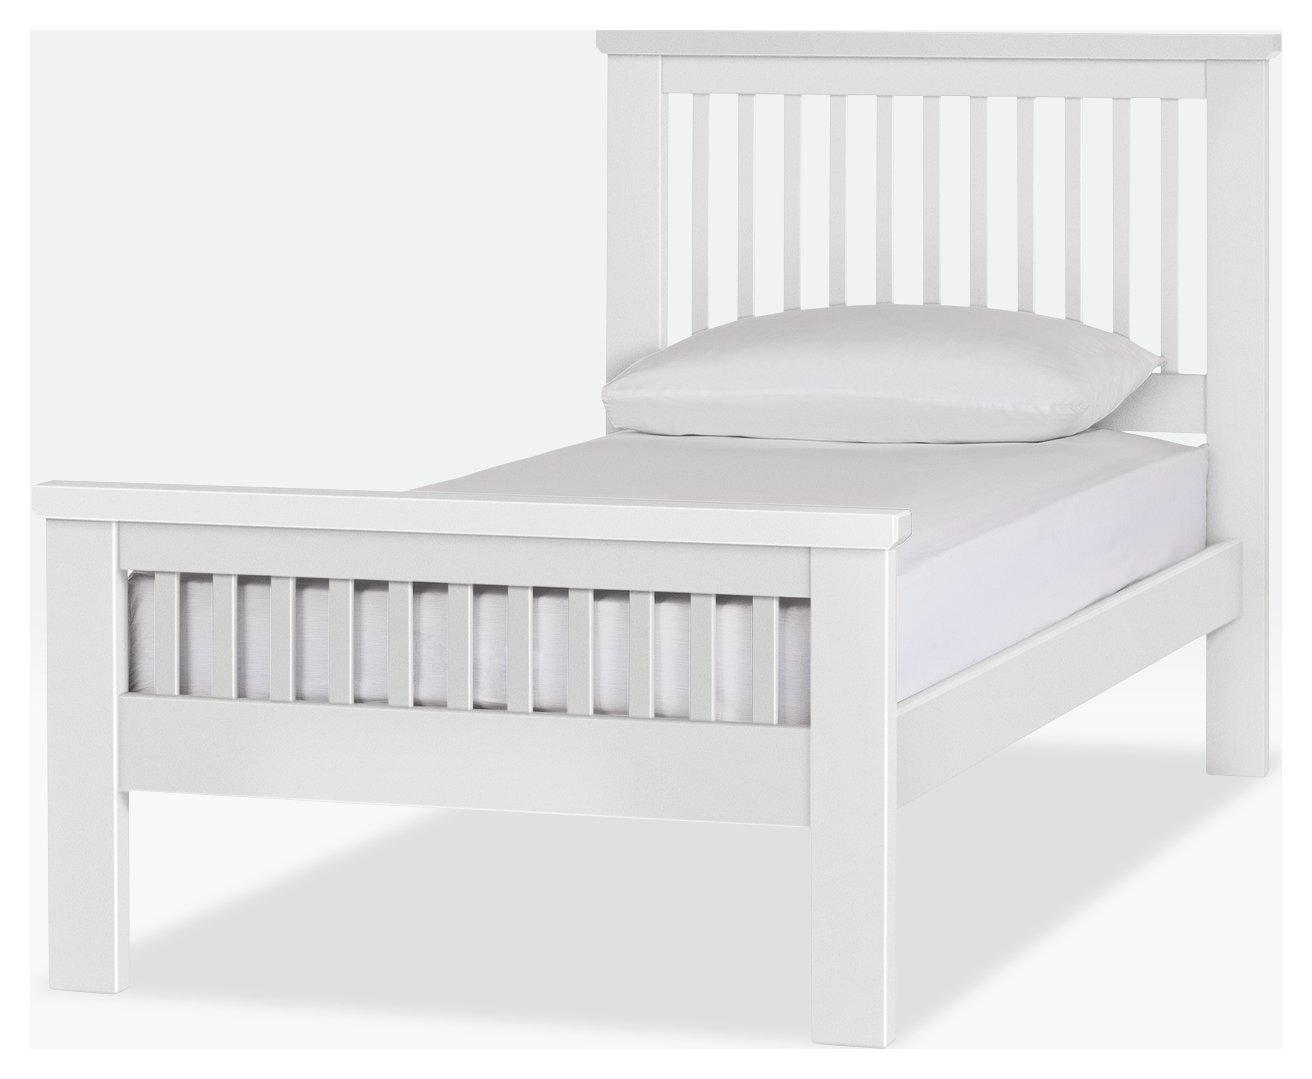 Bed Frames | Metal, Wooden U0026 Fabric Bed Frames | Argos